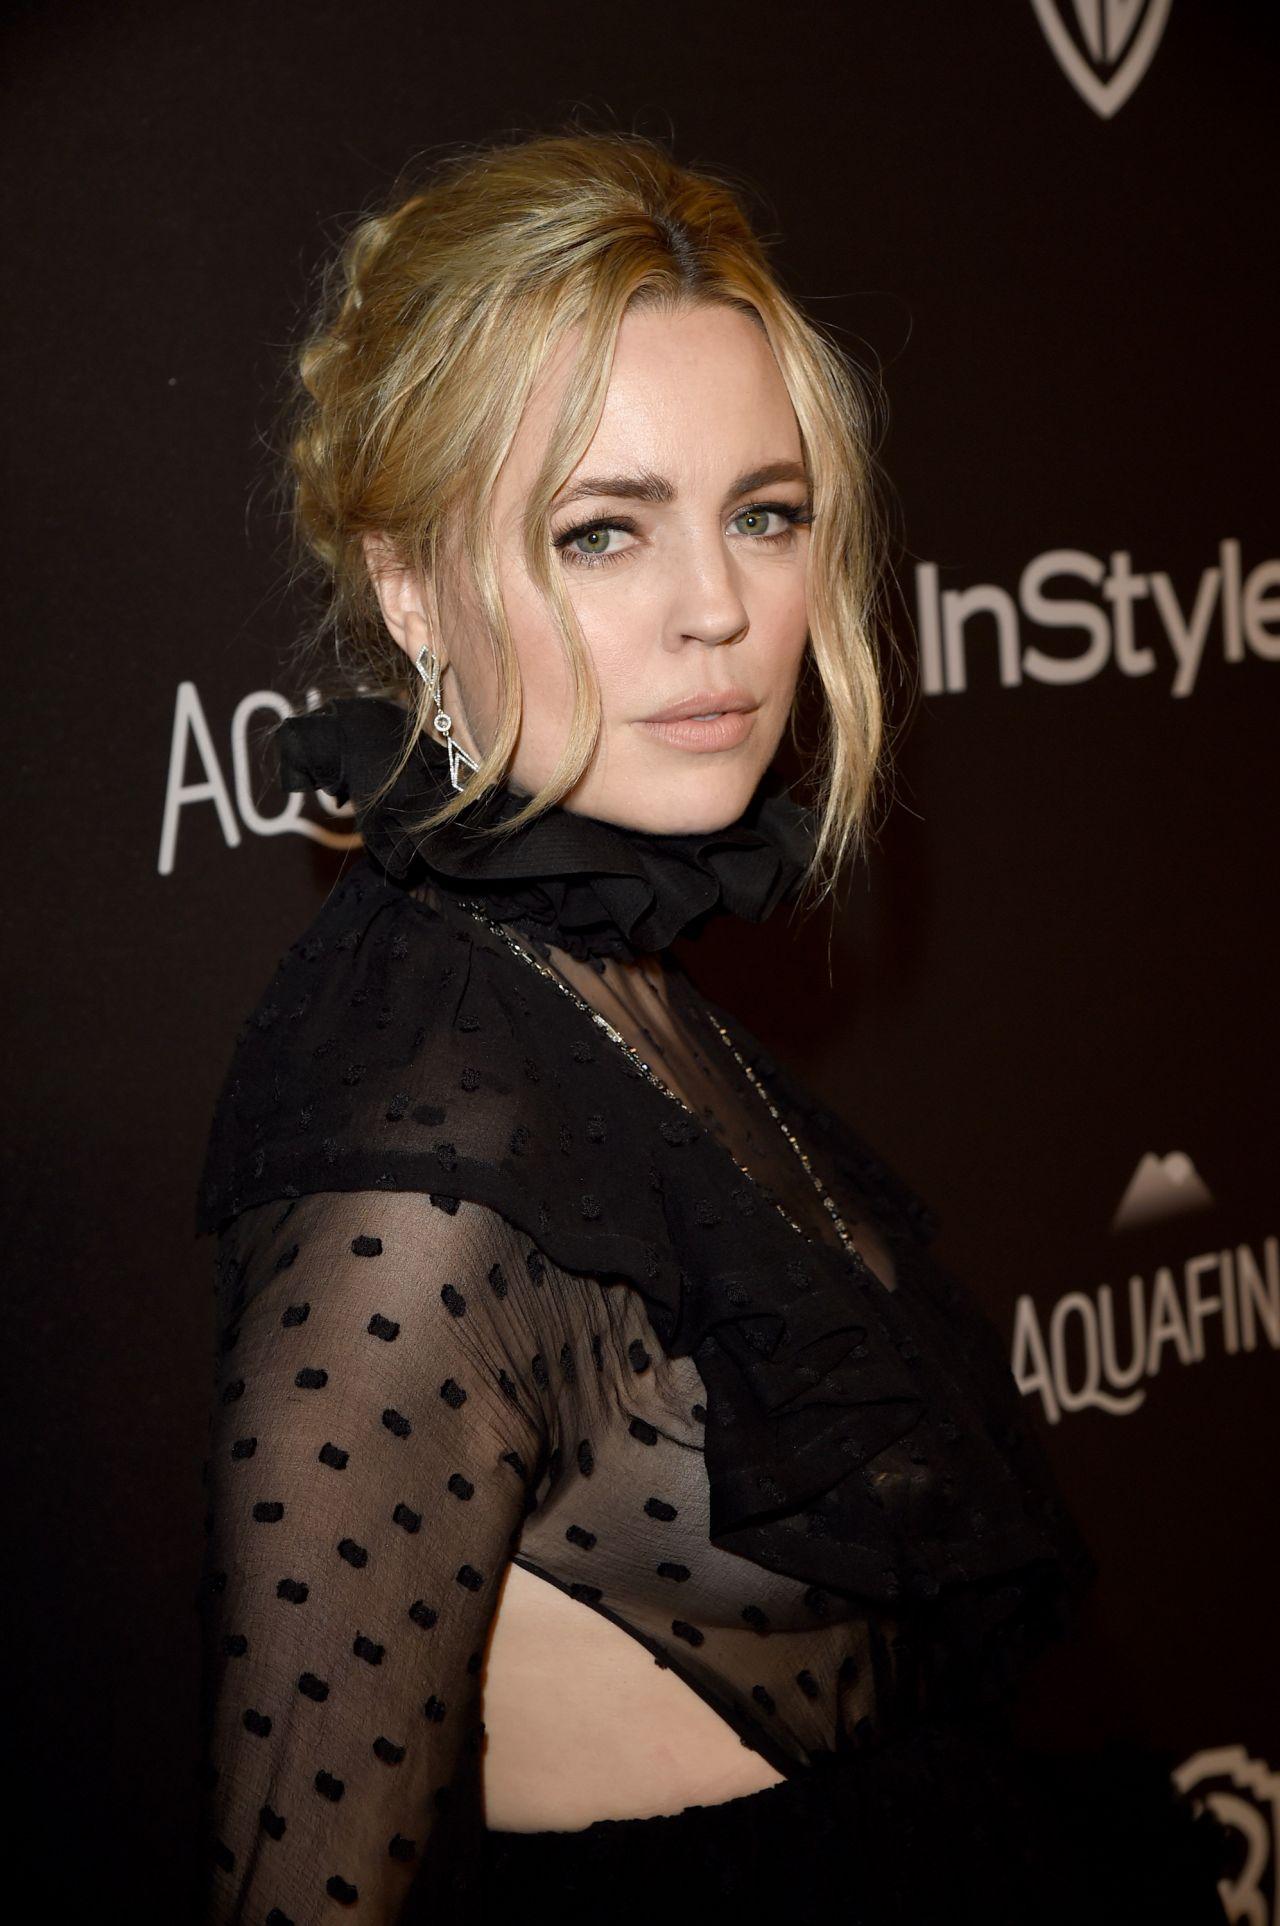 Draya michele naked 7 Photos,Kristen Stewart Shows Her Bare Ass Porno image Bai Ling pantyless. 2018-2019 celebrityes photos leaks!,Paris hilton upskirt